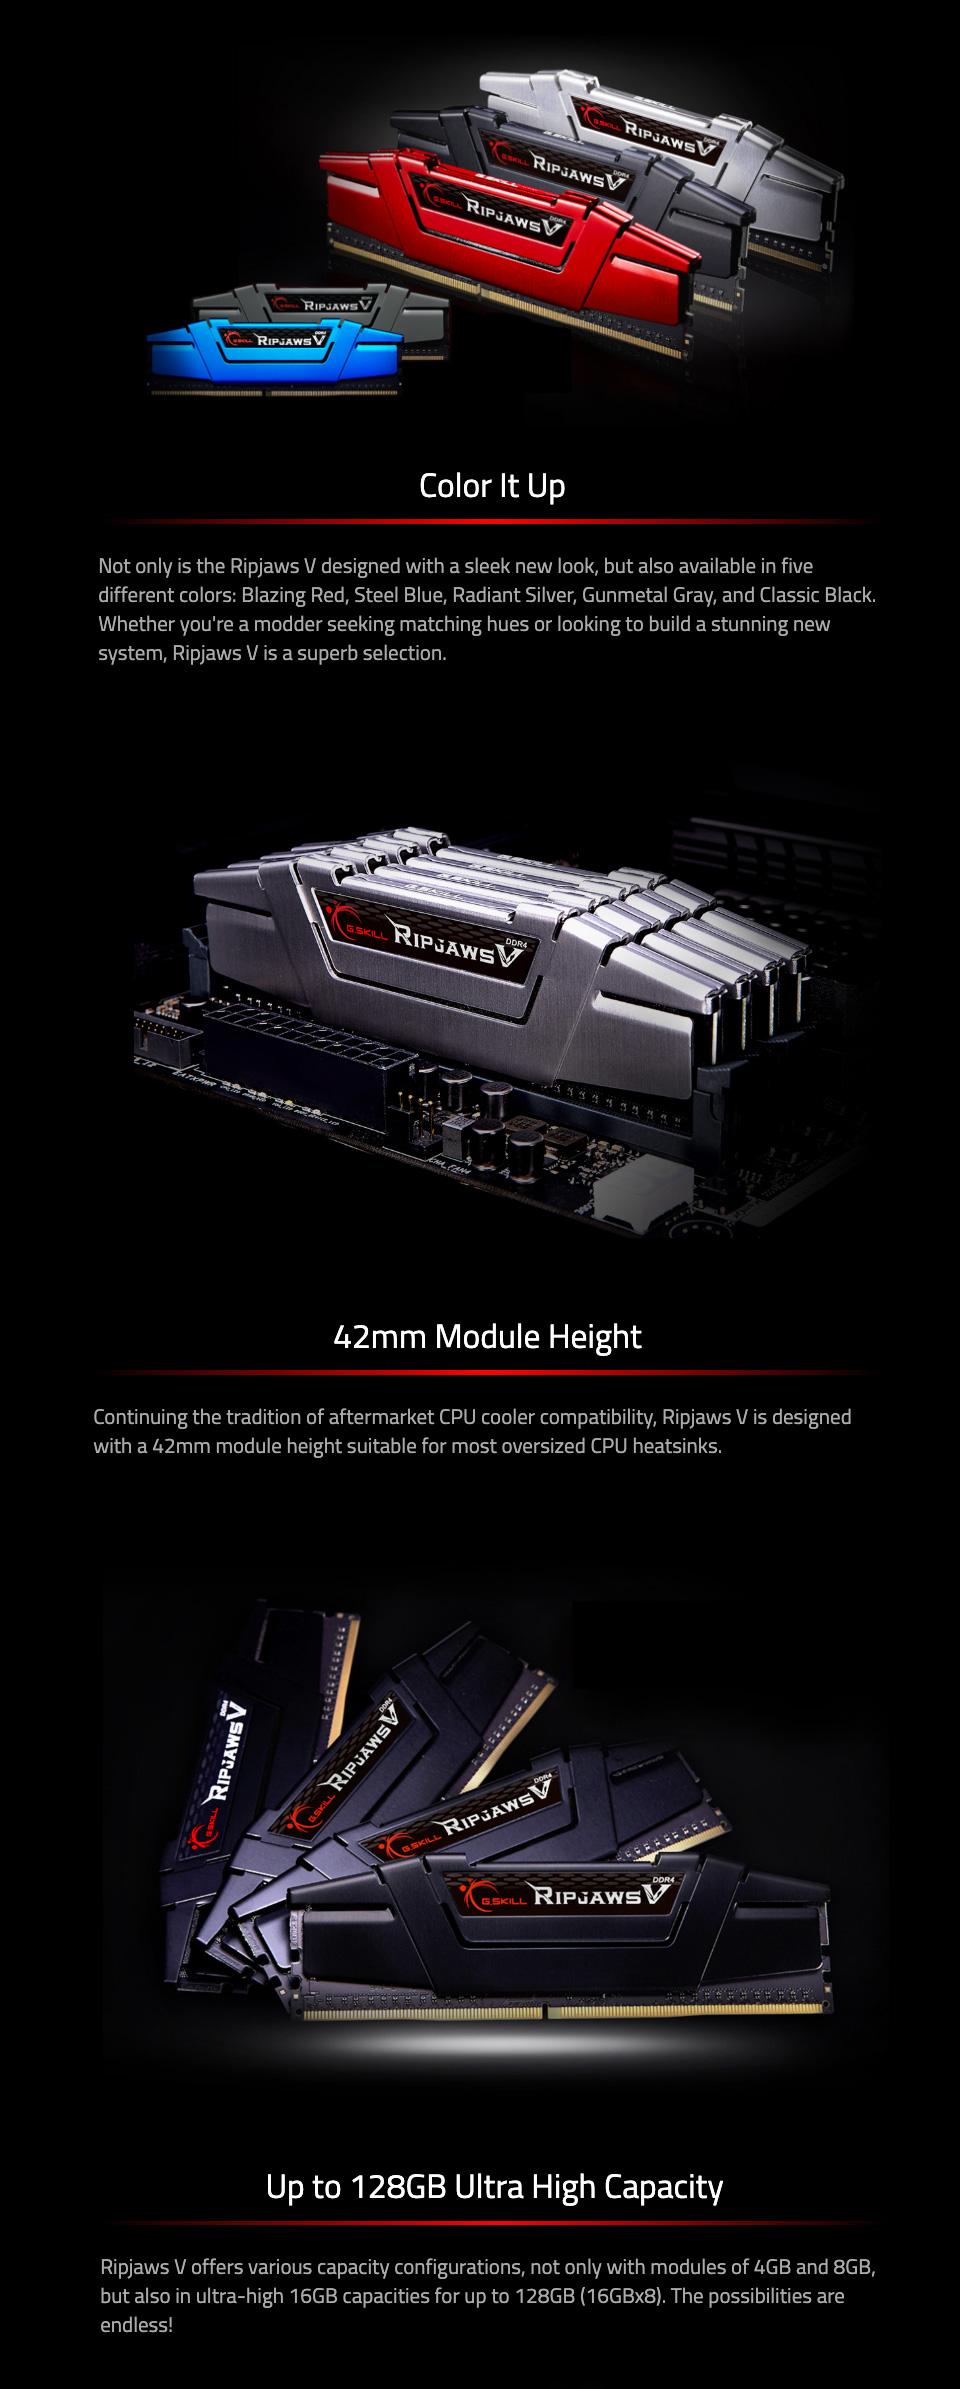 G.Skill Ripjaws V F4-4000C18D-16GVK 16GB (2x8GB) DDR4 features 2